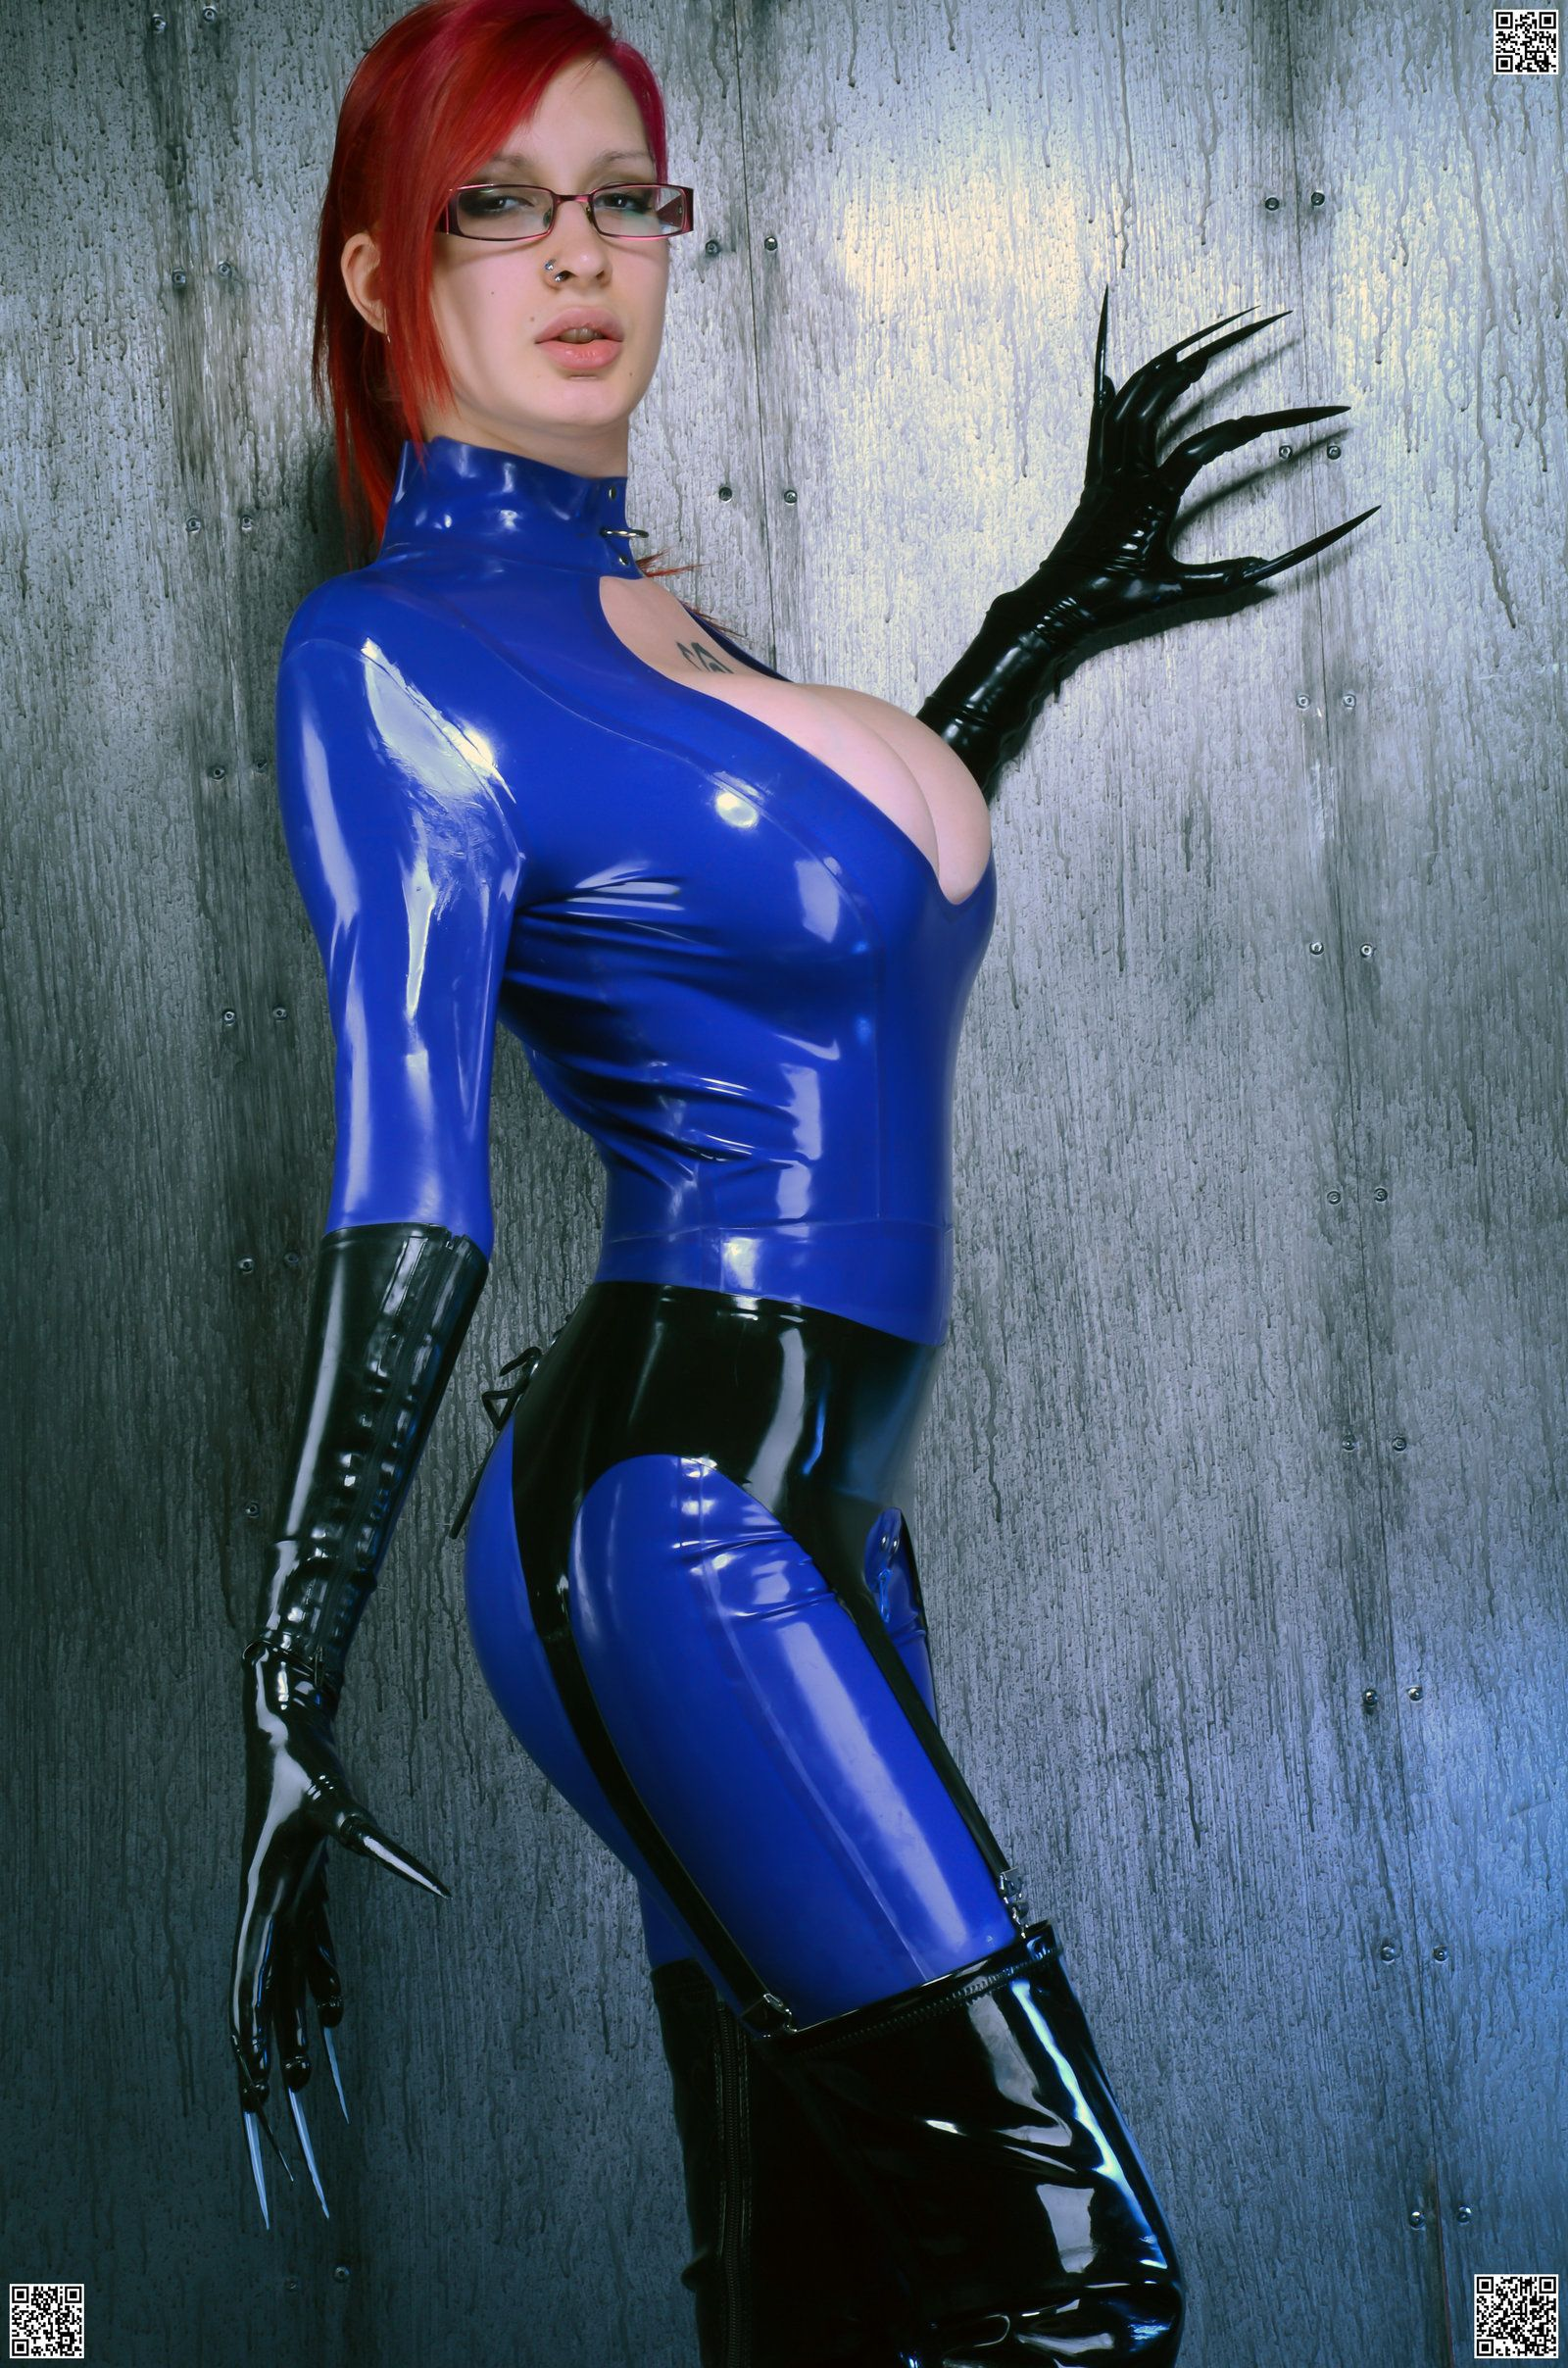 ariane saint amour cosplay Achernar VII by Ariane-Saint-Amour.deviantart.com on @deviantART